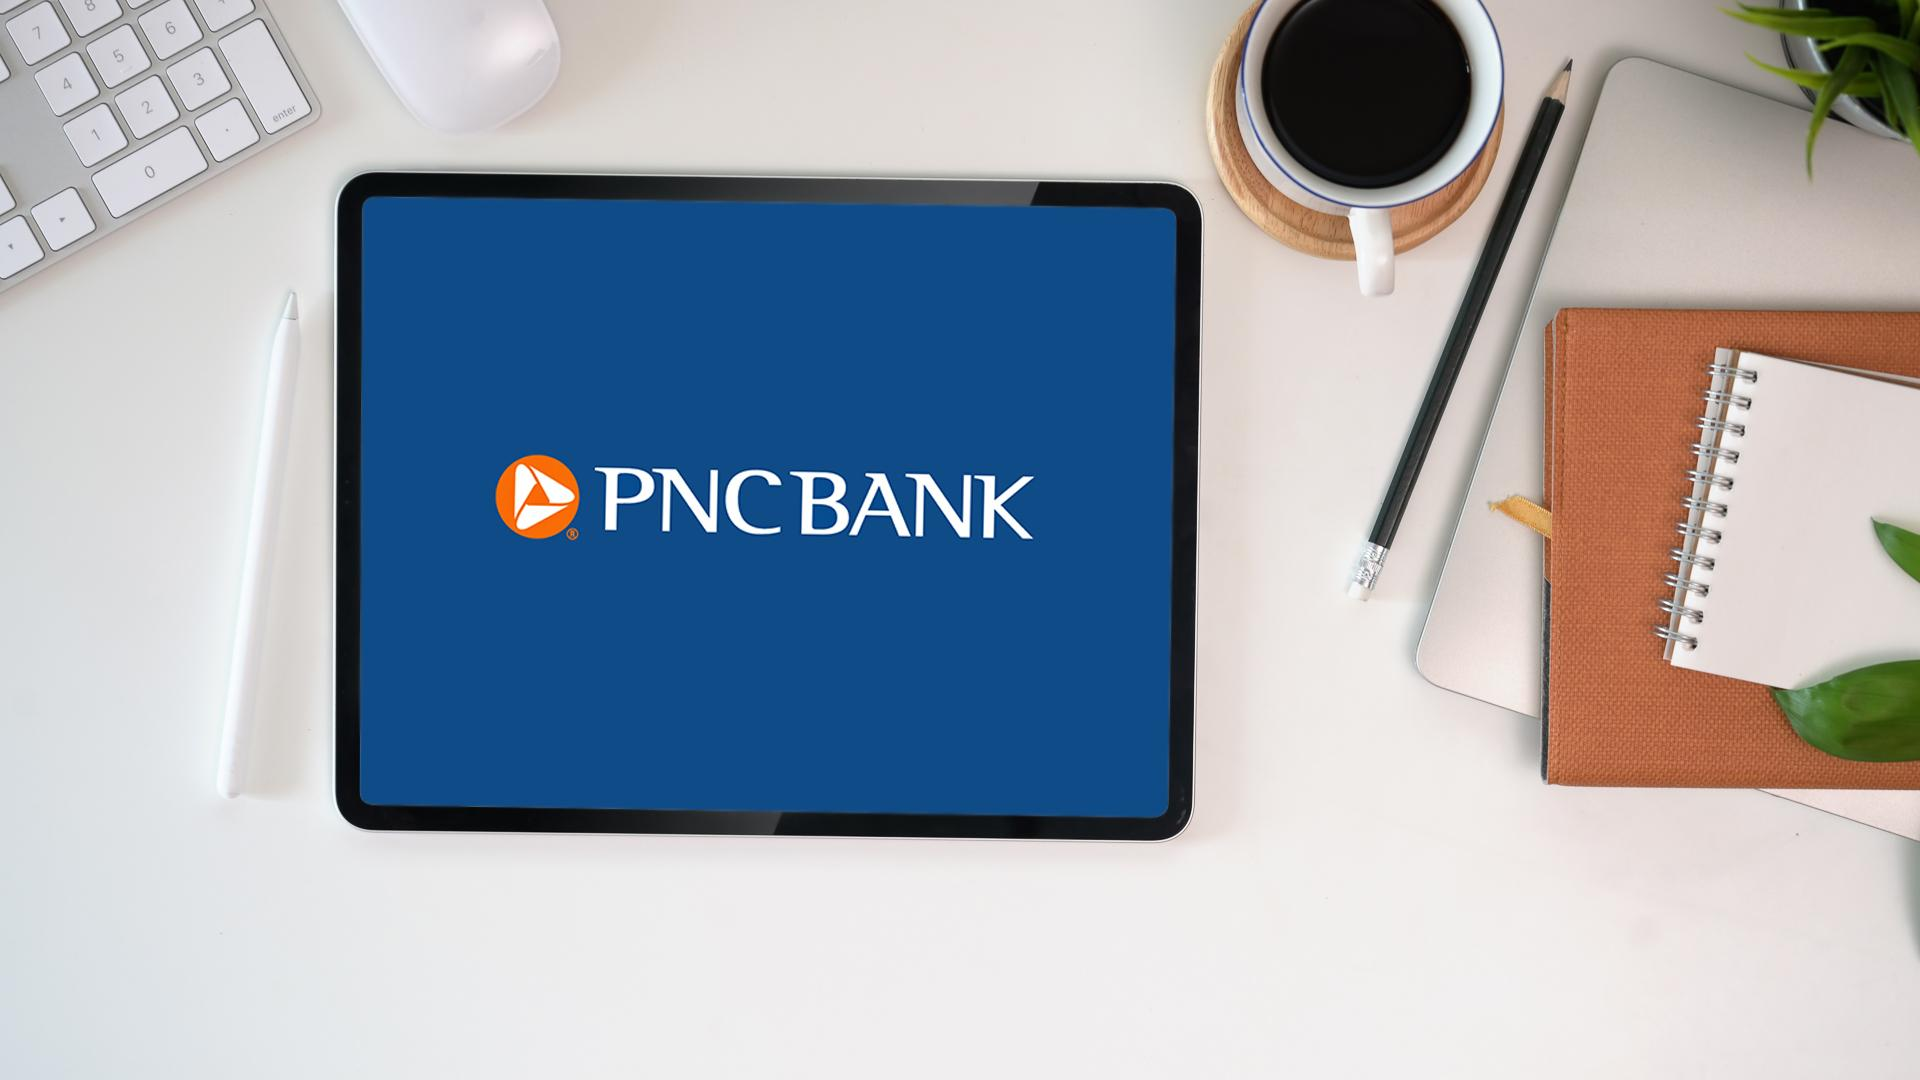 PNC Bank mobile banking app